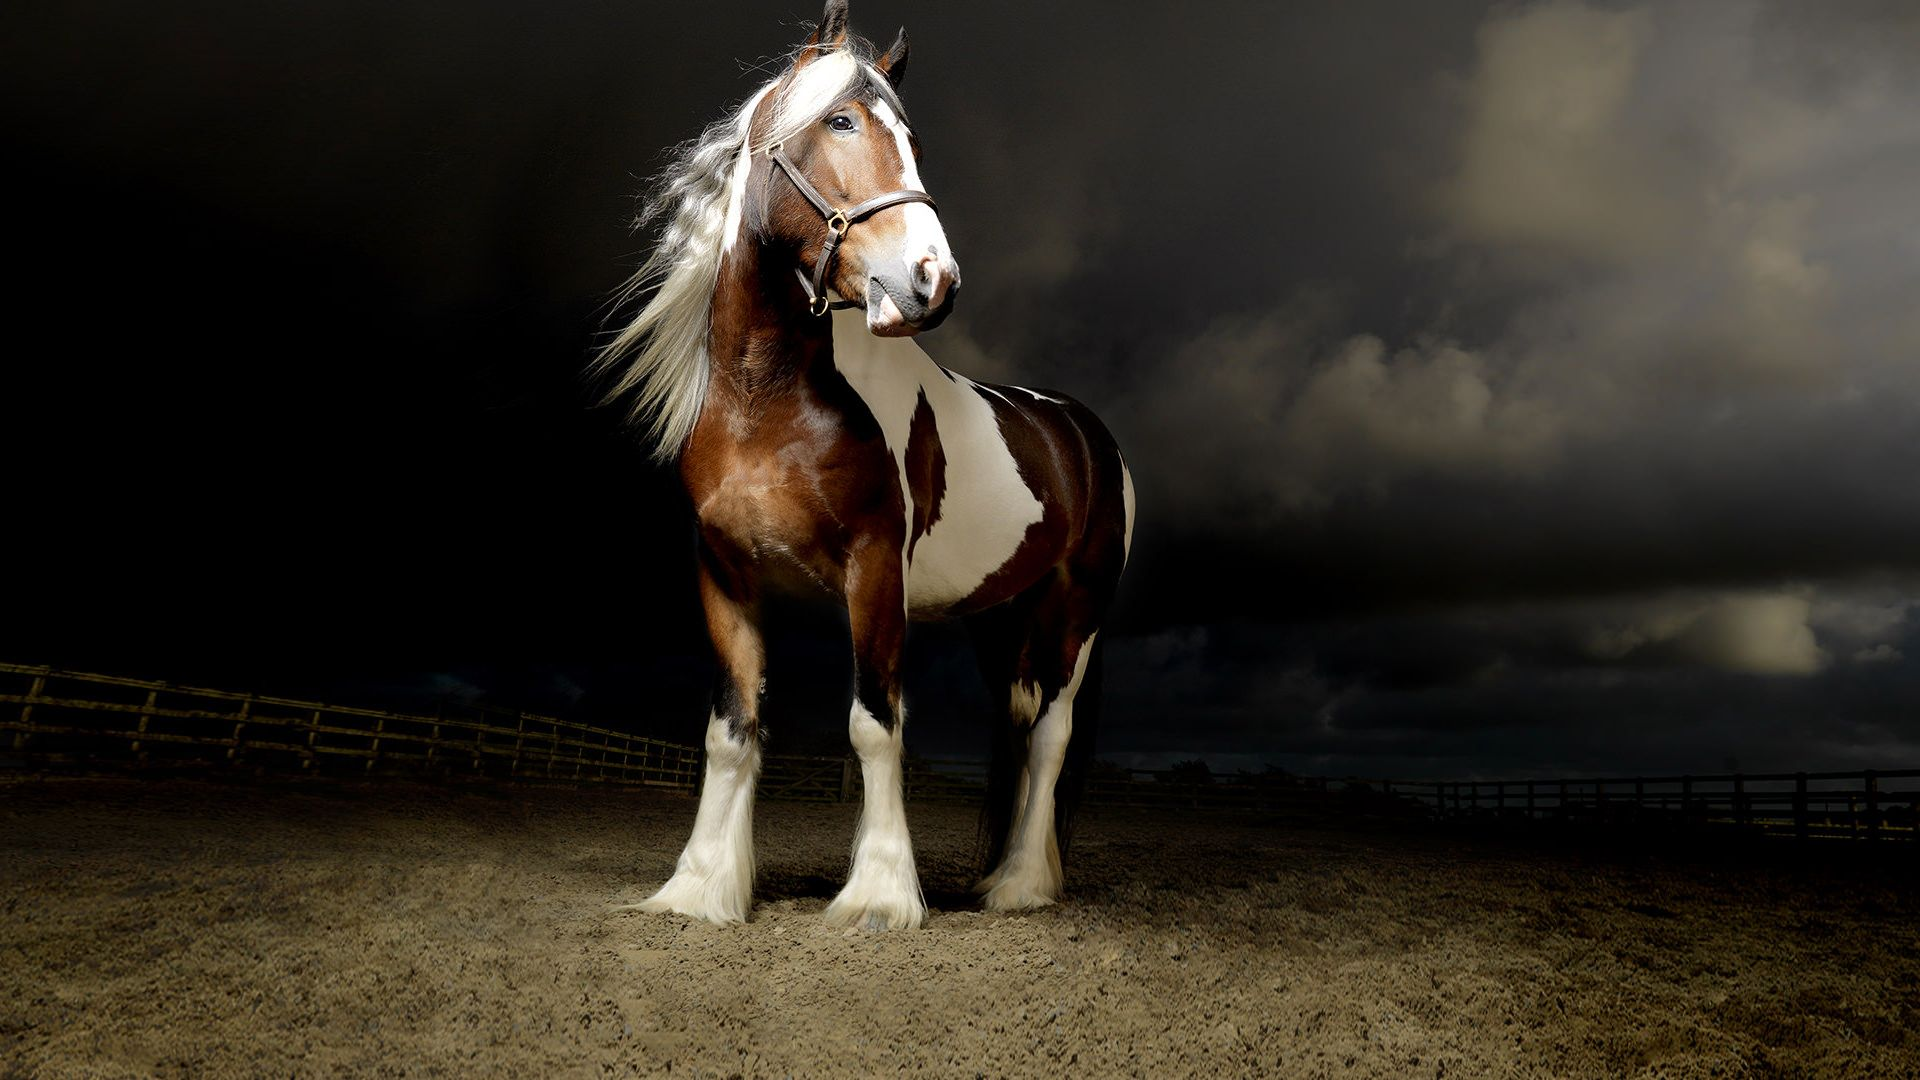 Matthew Seed The Horse Photographer Jpg 1 920 1 080 Pixels Horse Photography Horse Photographer Horses